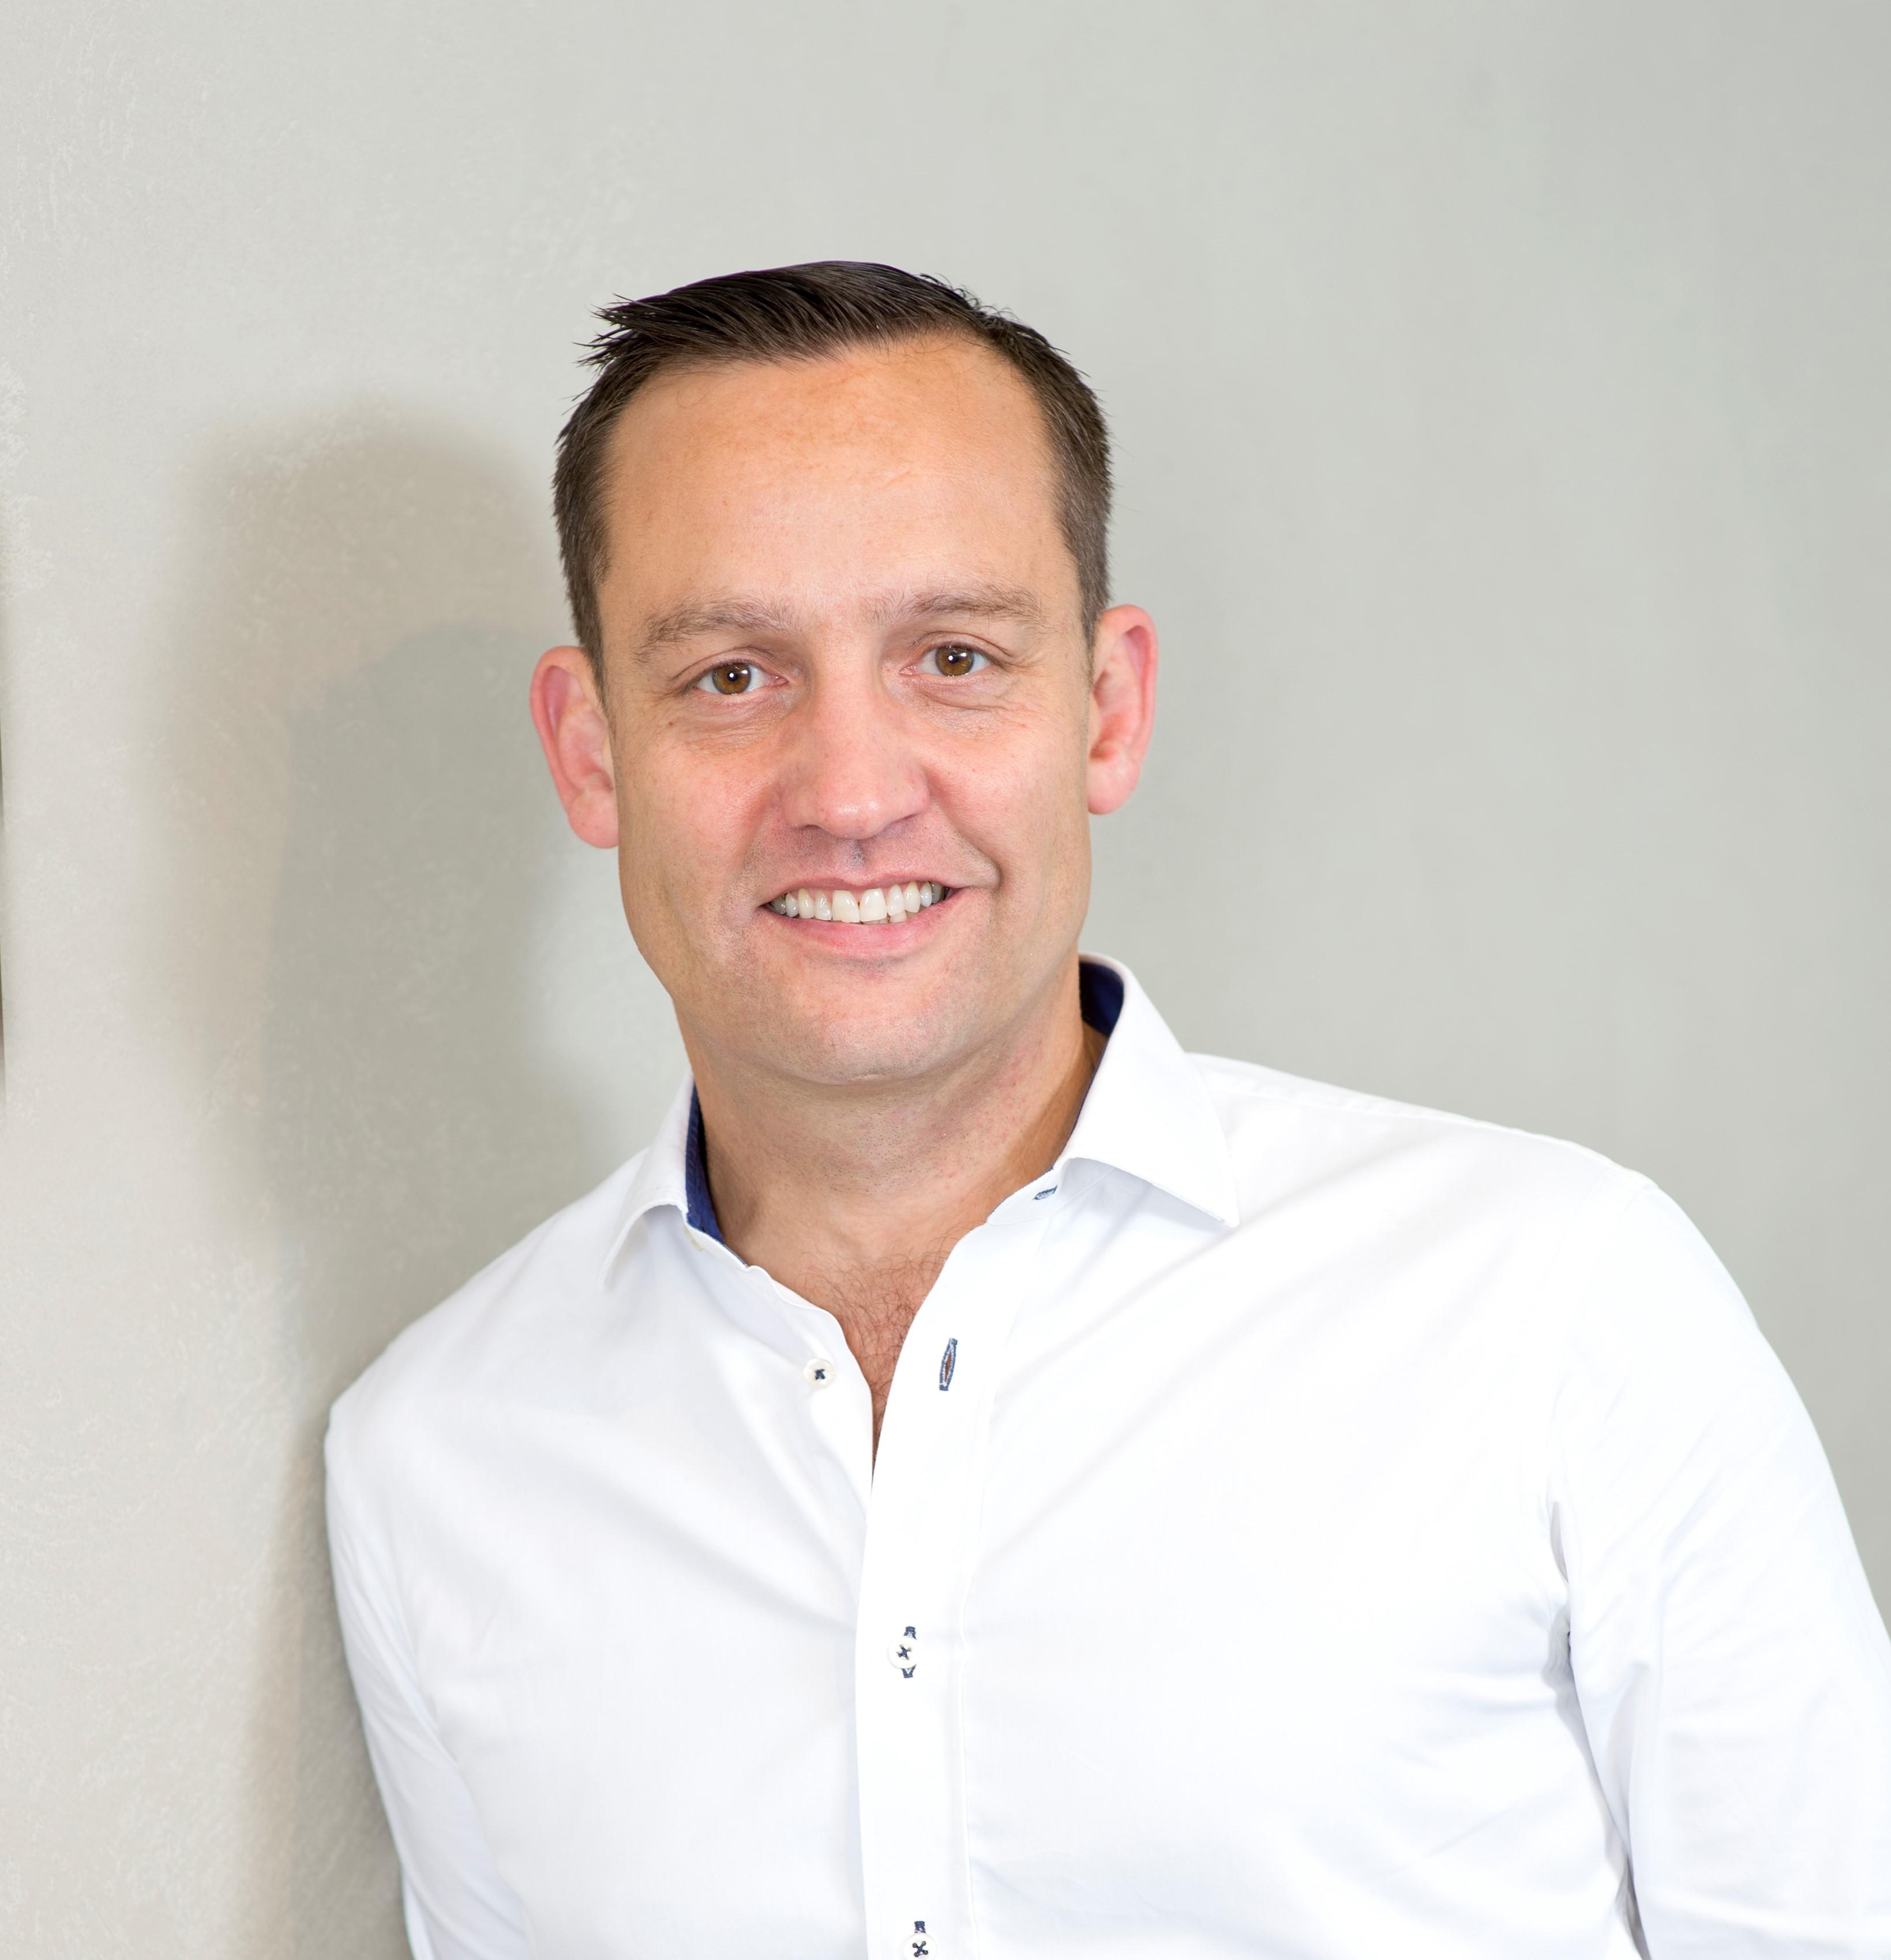 Erevena Welcomes Ex-Oracle EMEA Executive Leadership Recruiter, Grant Hayward